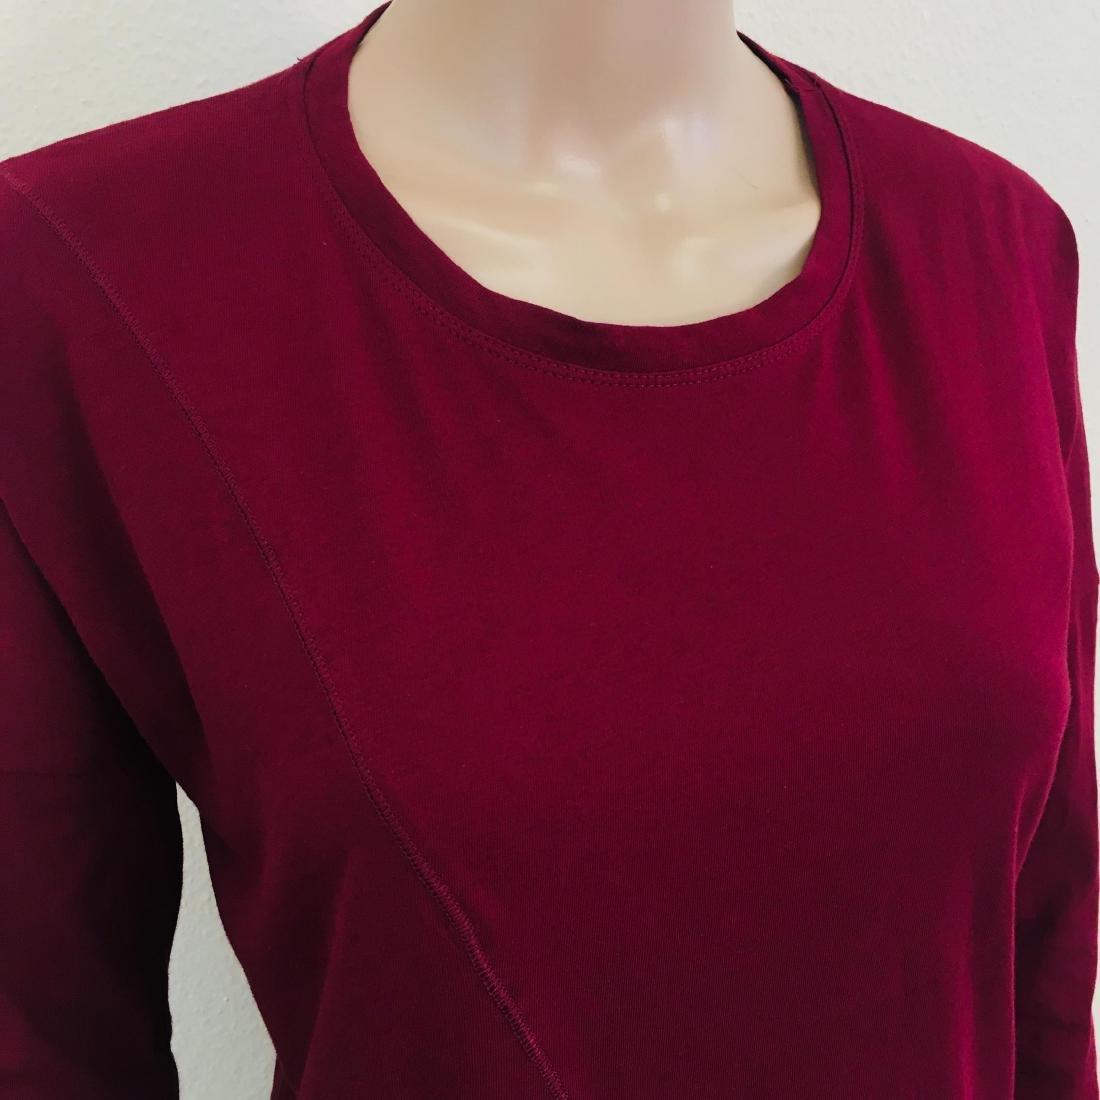 New Women's ZARA Top Blouse Size S - 5